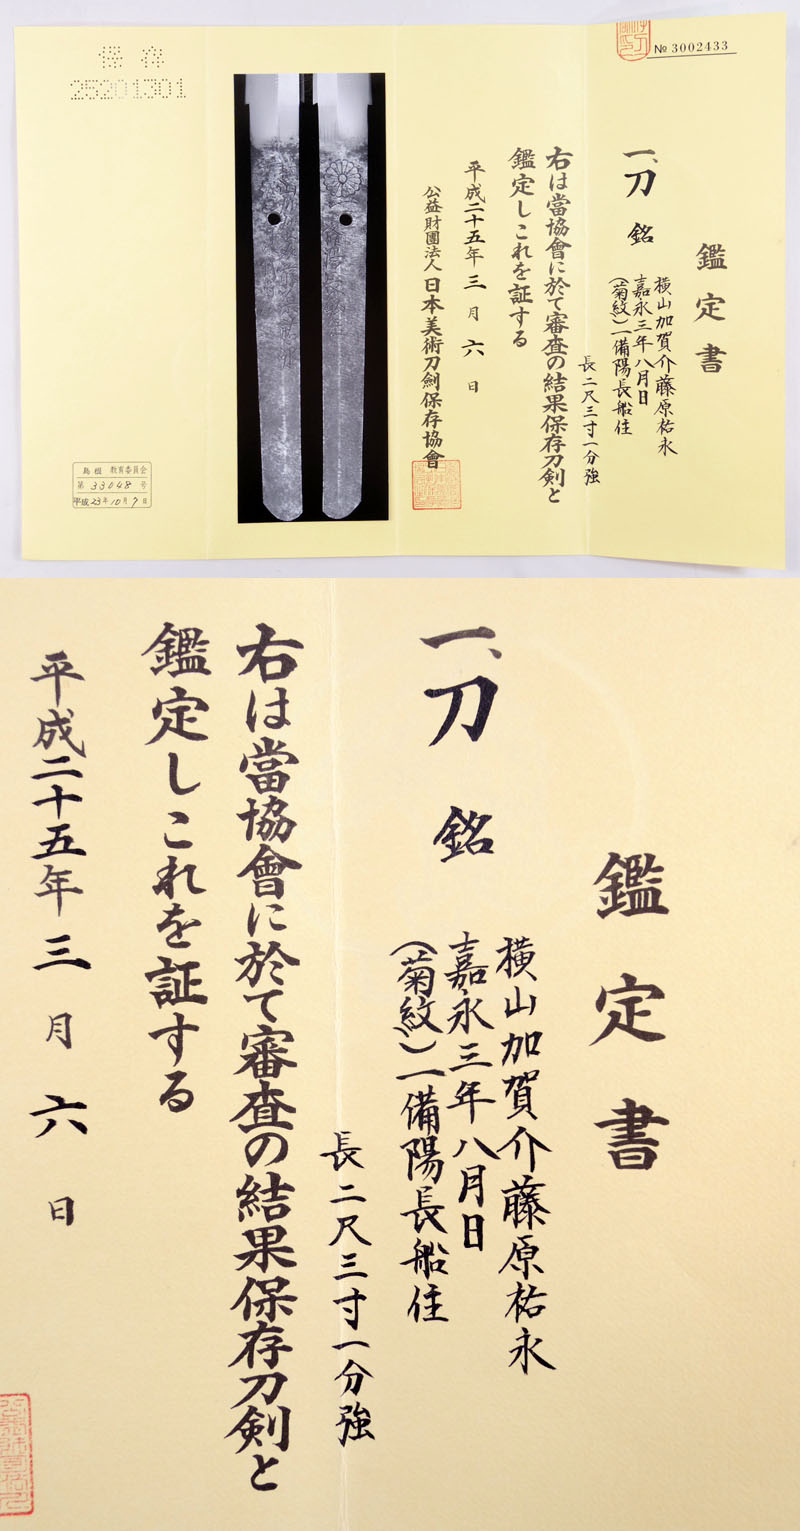 横山加賀介藤原祐永 Picture of Certificate